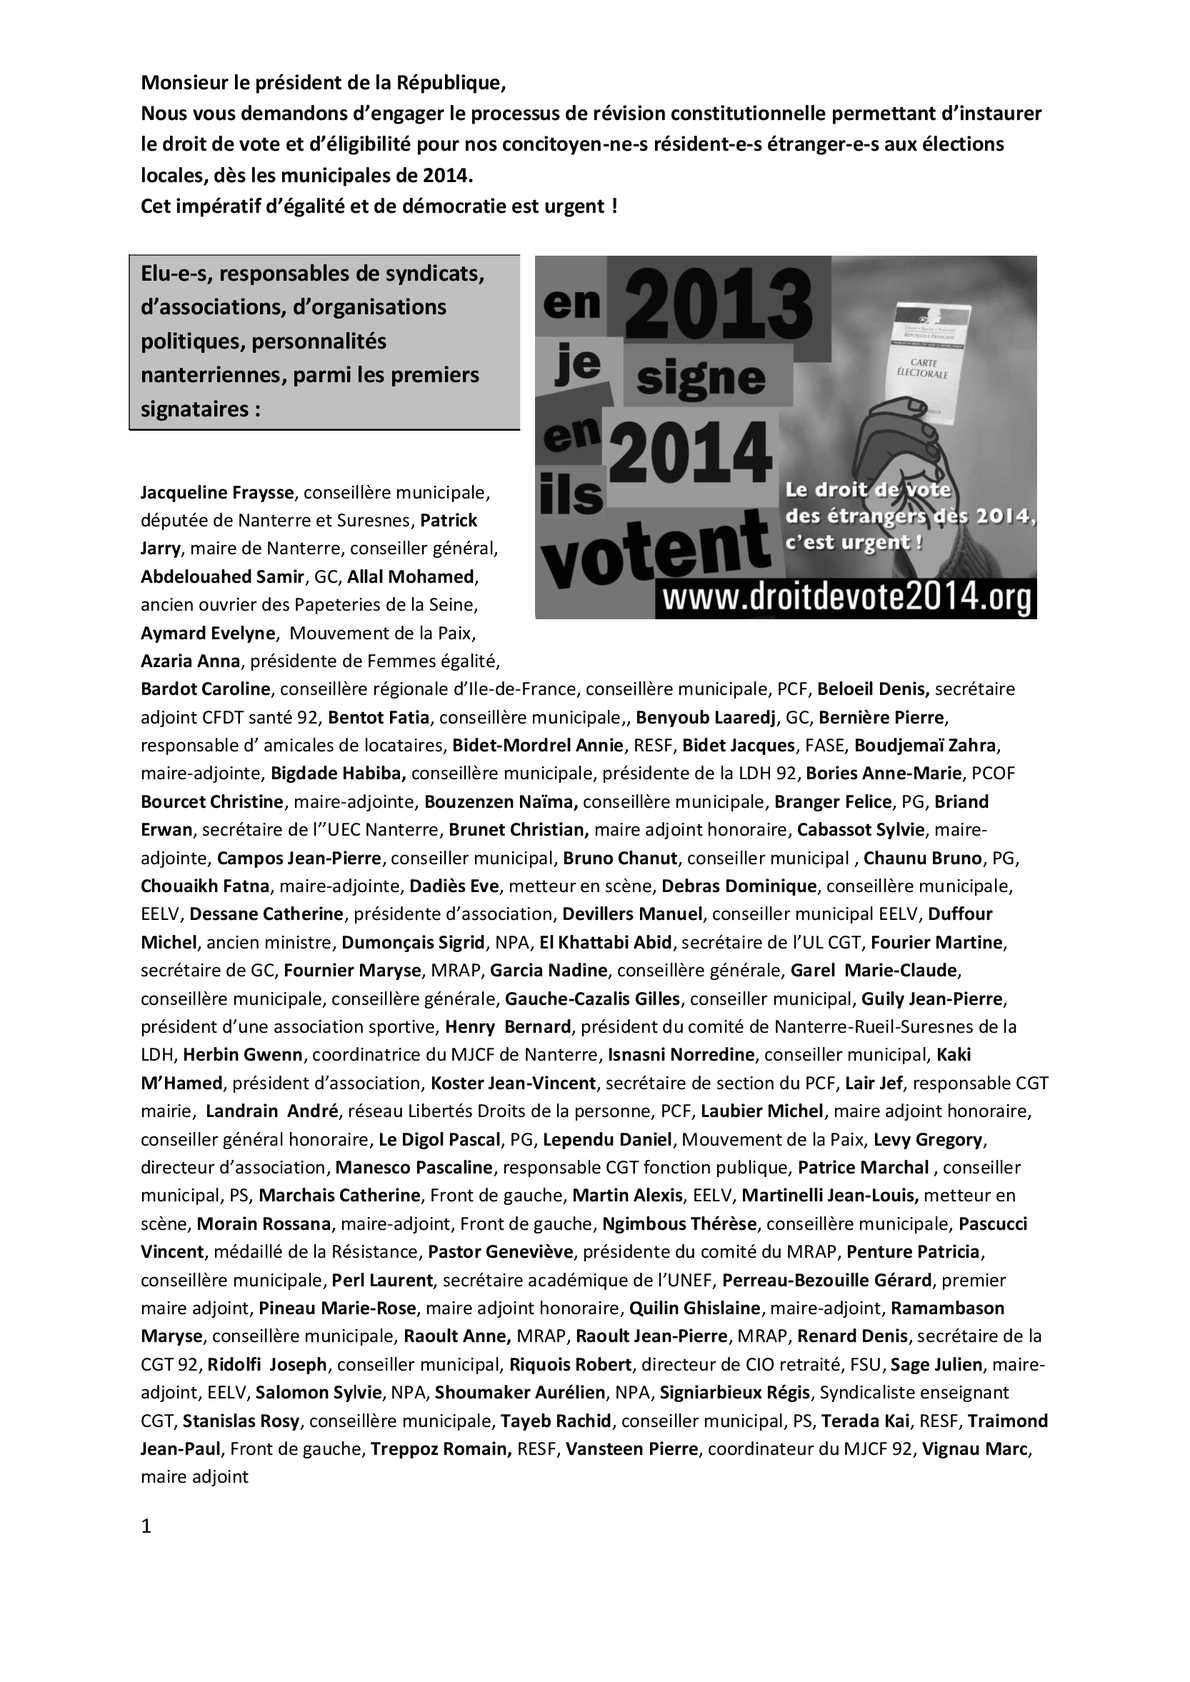 Calam o ddv 2014 400 premiers signataires nanterriens for Papeterie beloeil